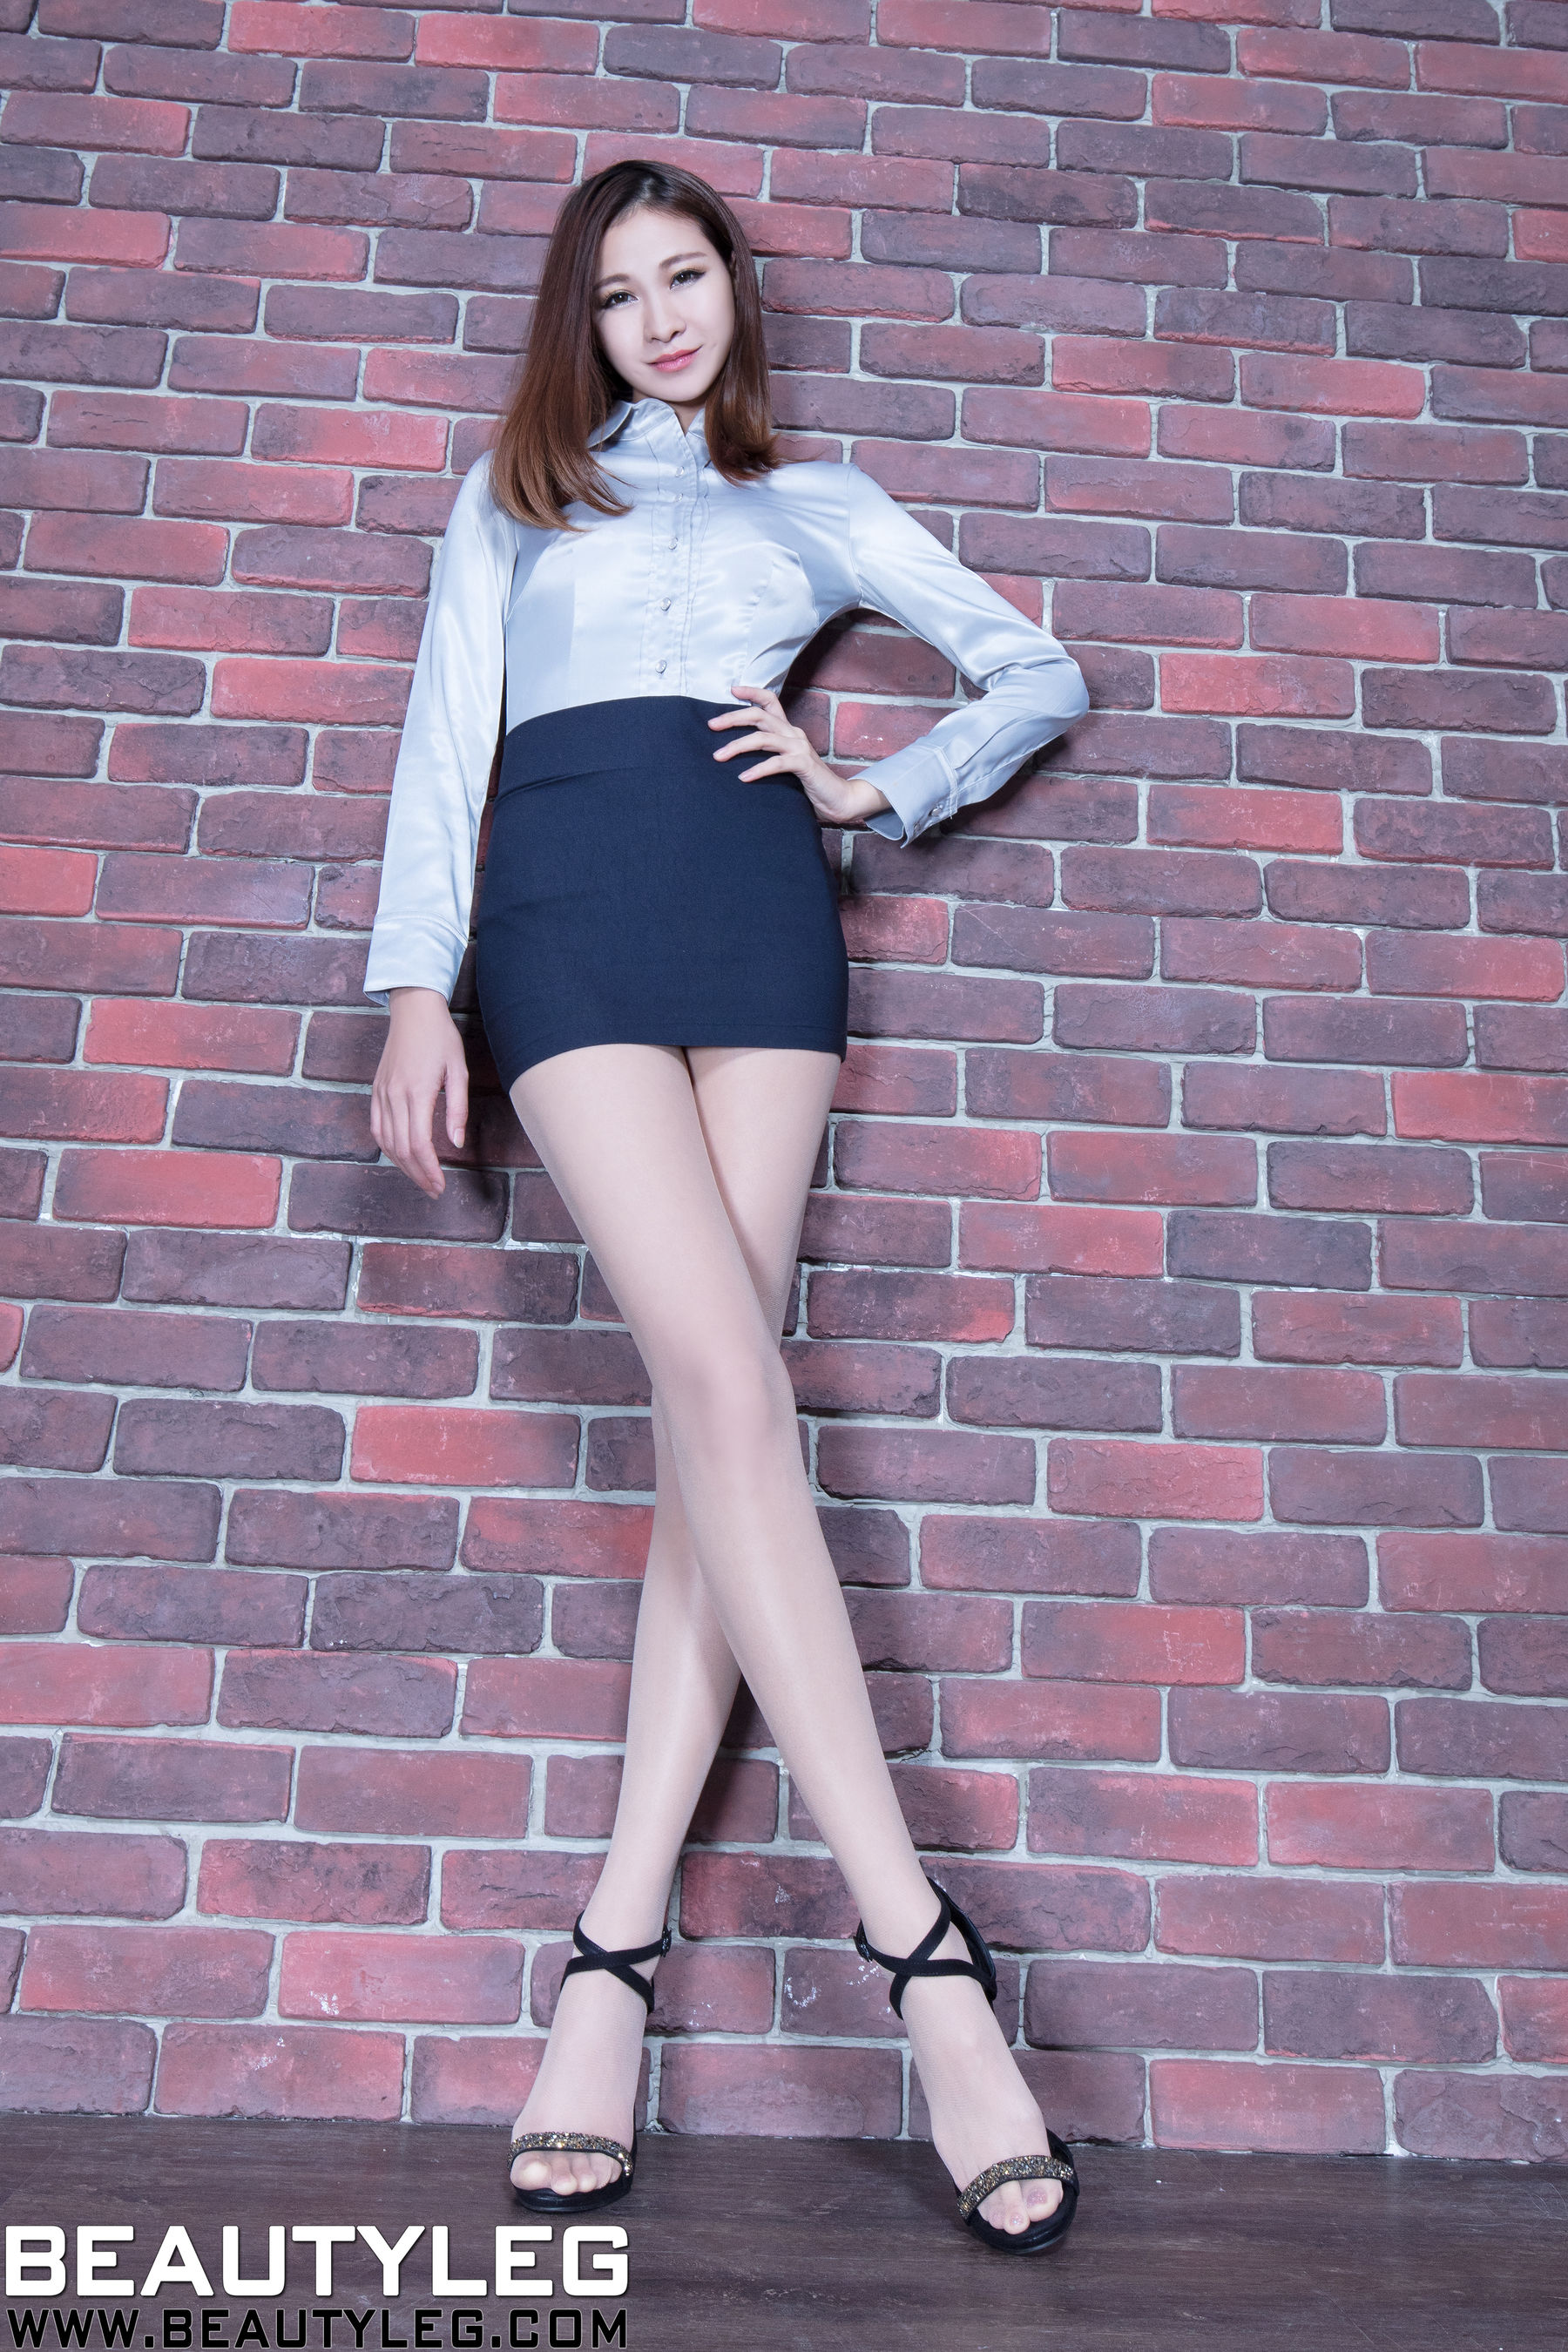 VOL.1513 [Beautyleg]丝袜美腿高跟长腿美女:黄镫娴(腿模Neko)超高清个人性感漂亮大图(57P)